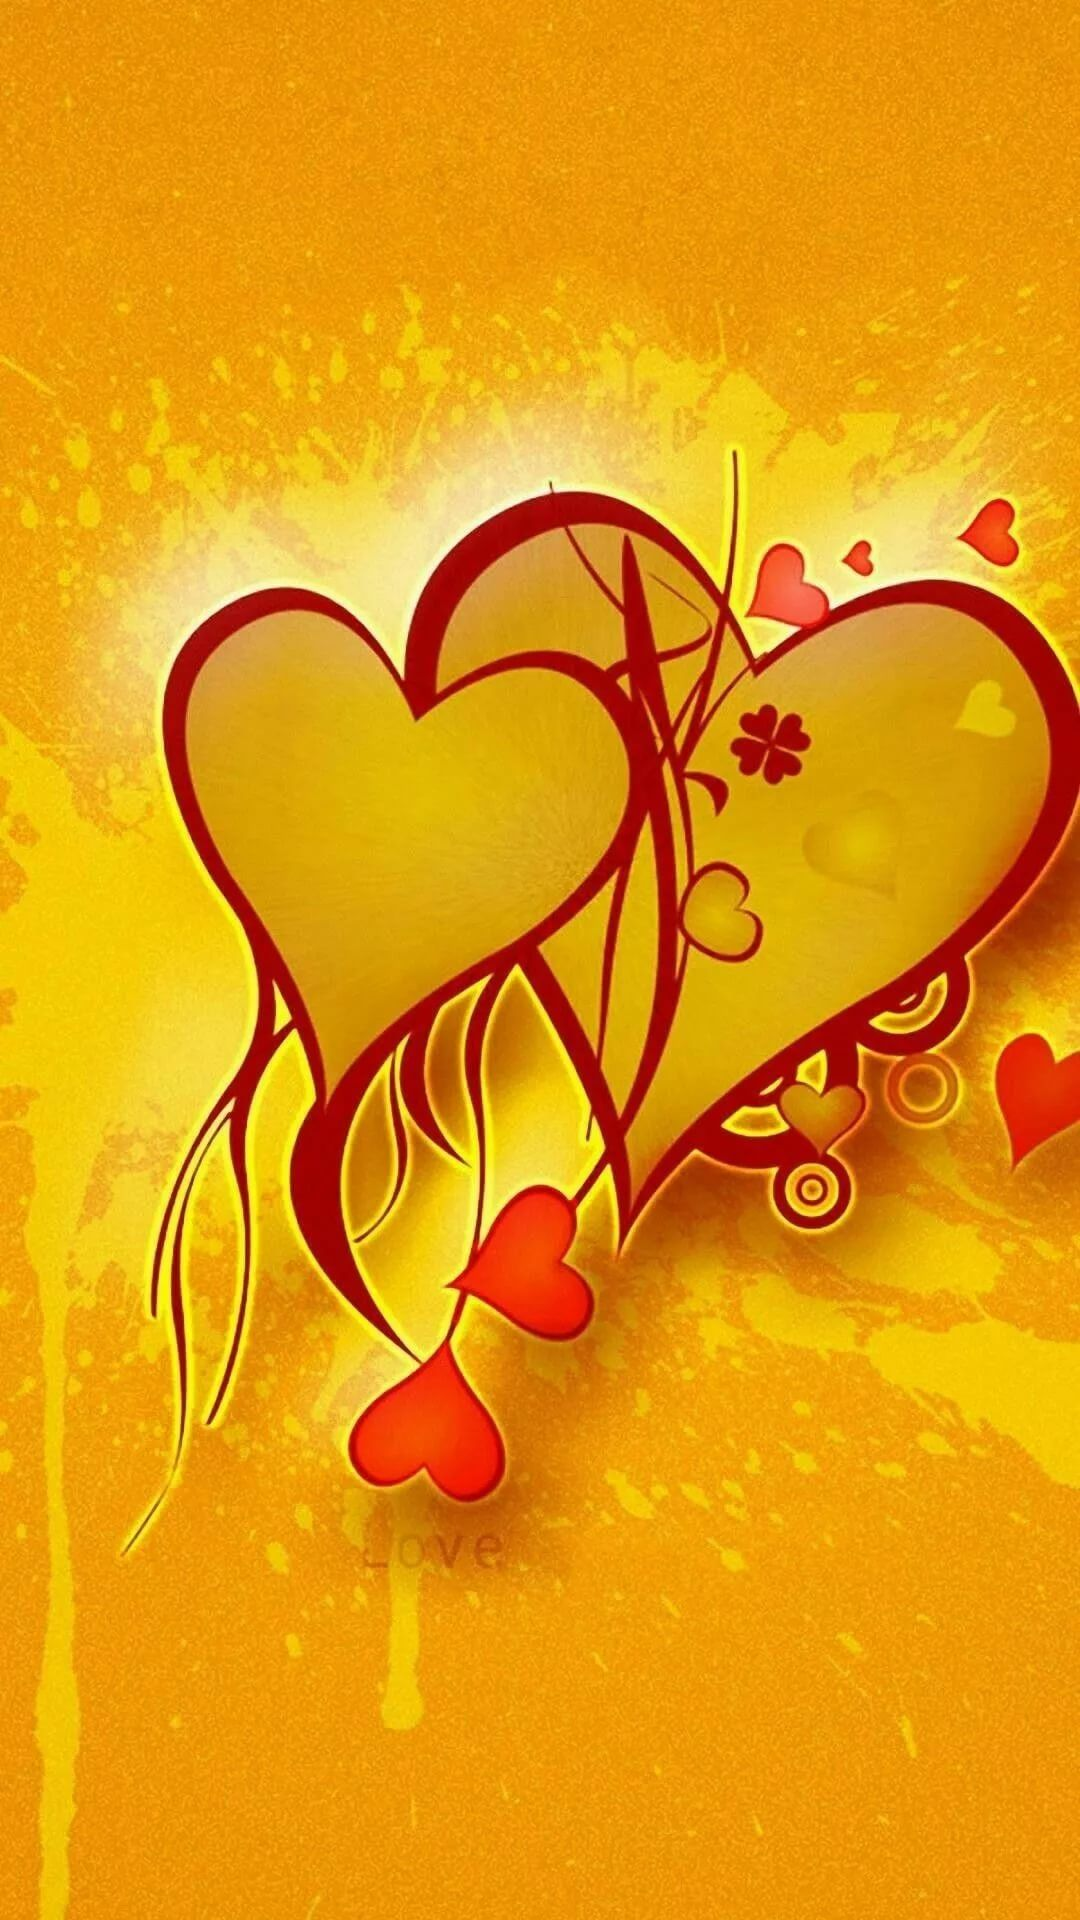 Cute Love background wallpaper